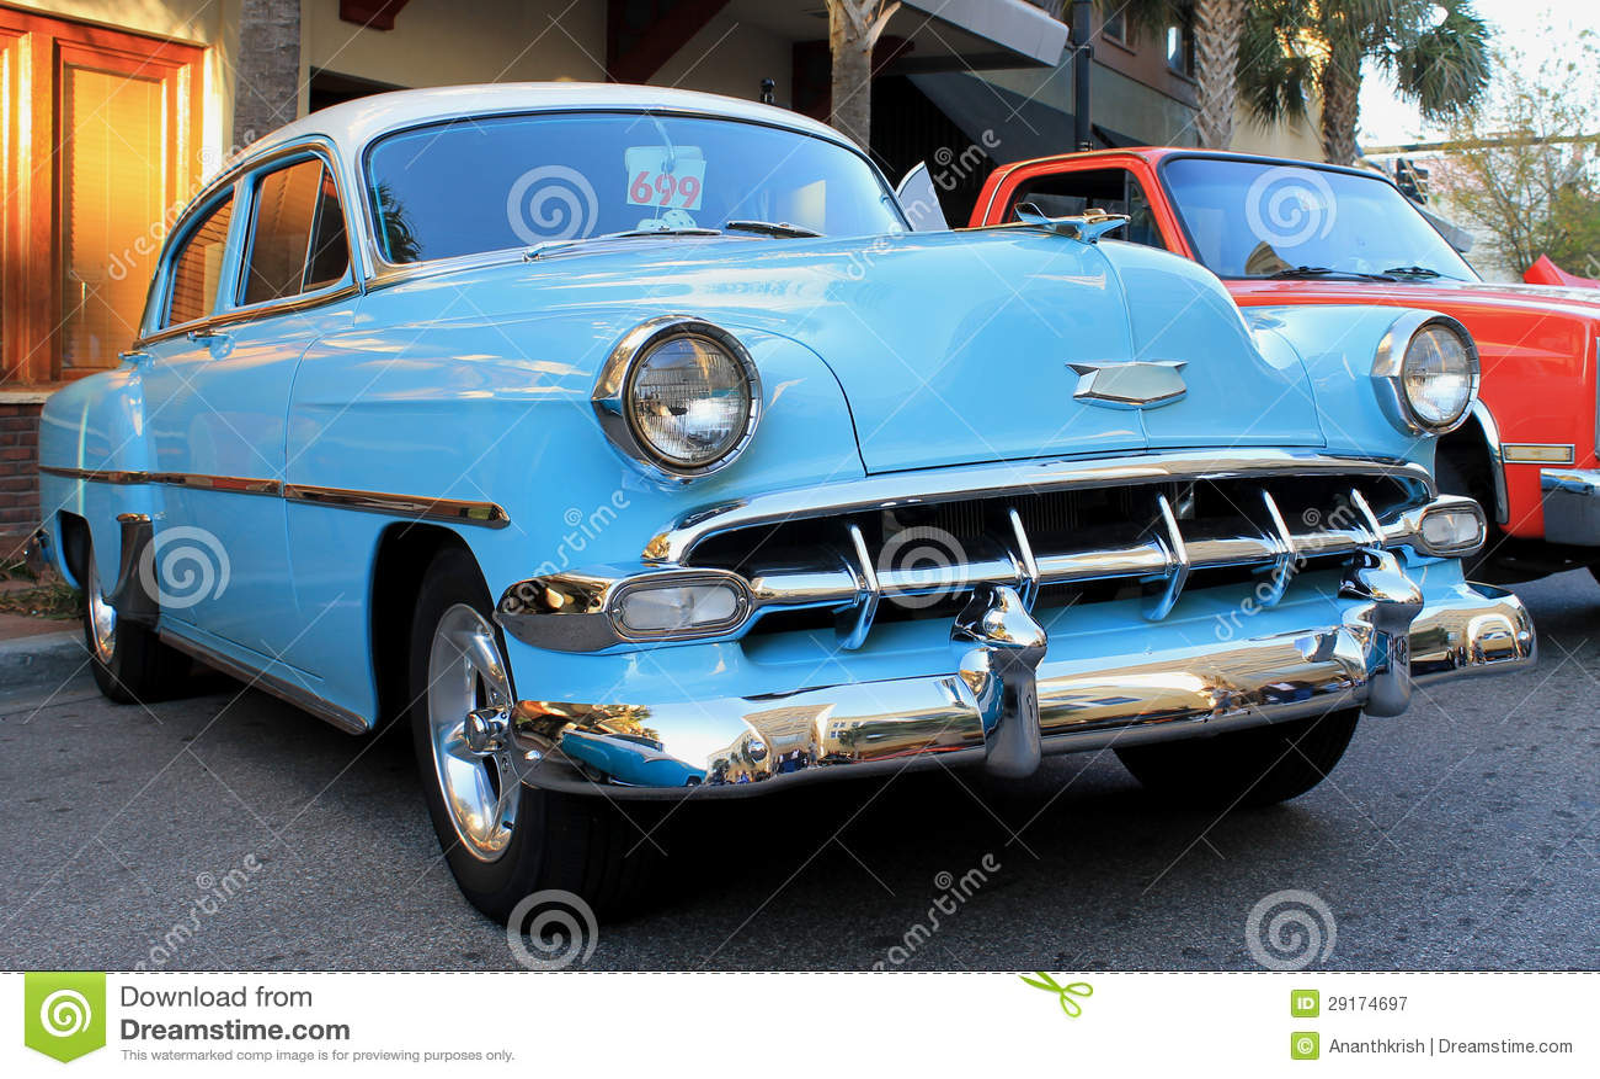 Old Chevrolet Car stock image. Image of preserve, automotive - 29174697